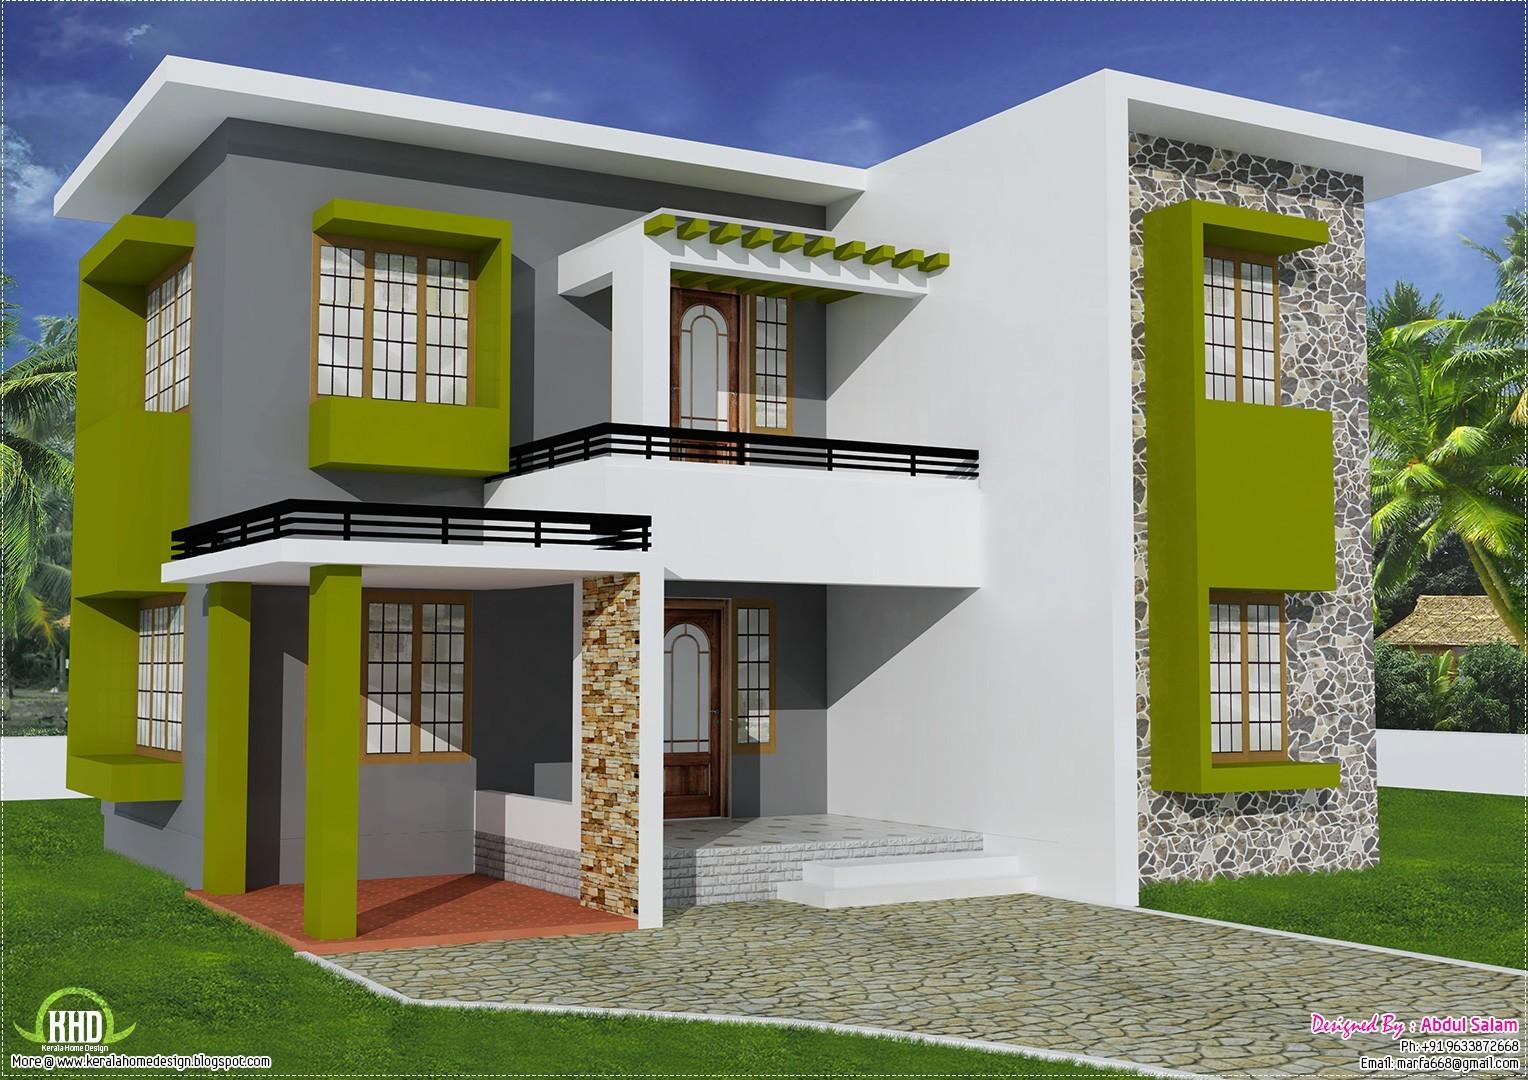 Photo of 2000 Square Feet 3BHK Kerala Home Design